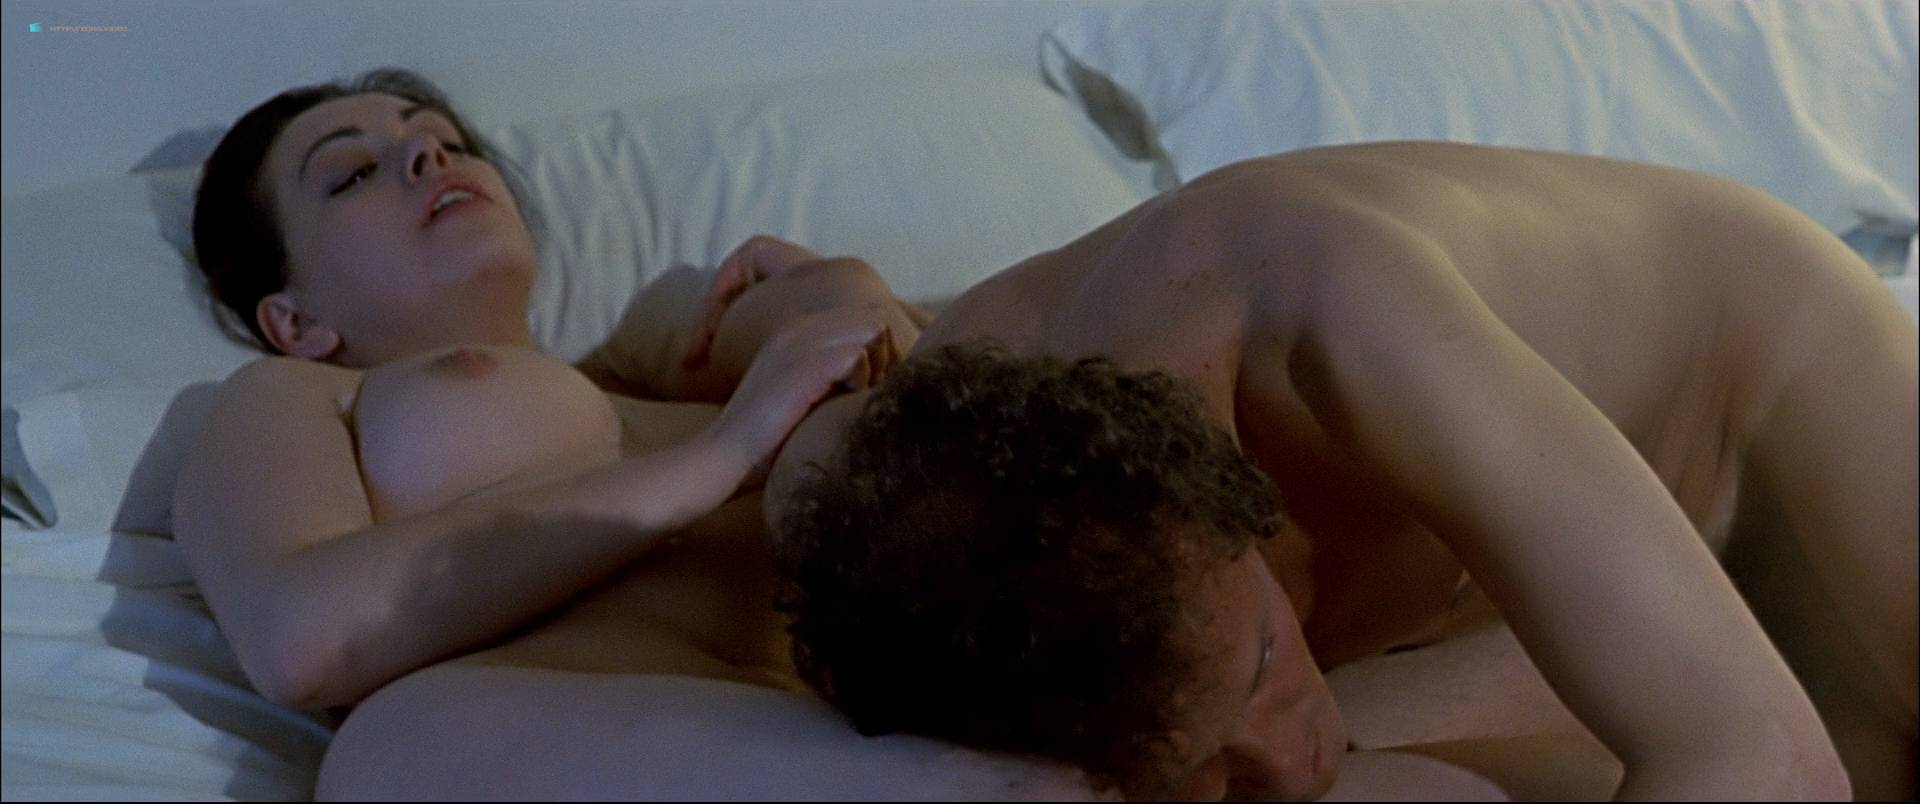 Lina Romay nude full frontal Mari Carmen Nieto, Alicia Príncipe nude too - Night of 1,000 Sexes (SP-1984) HD 1080p BluRay (8)